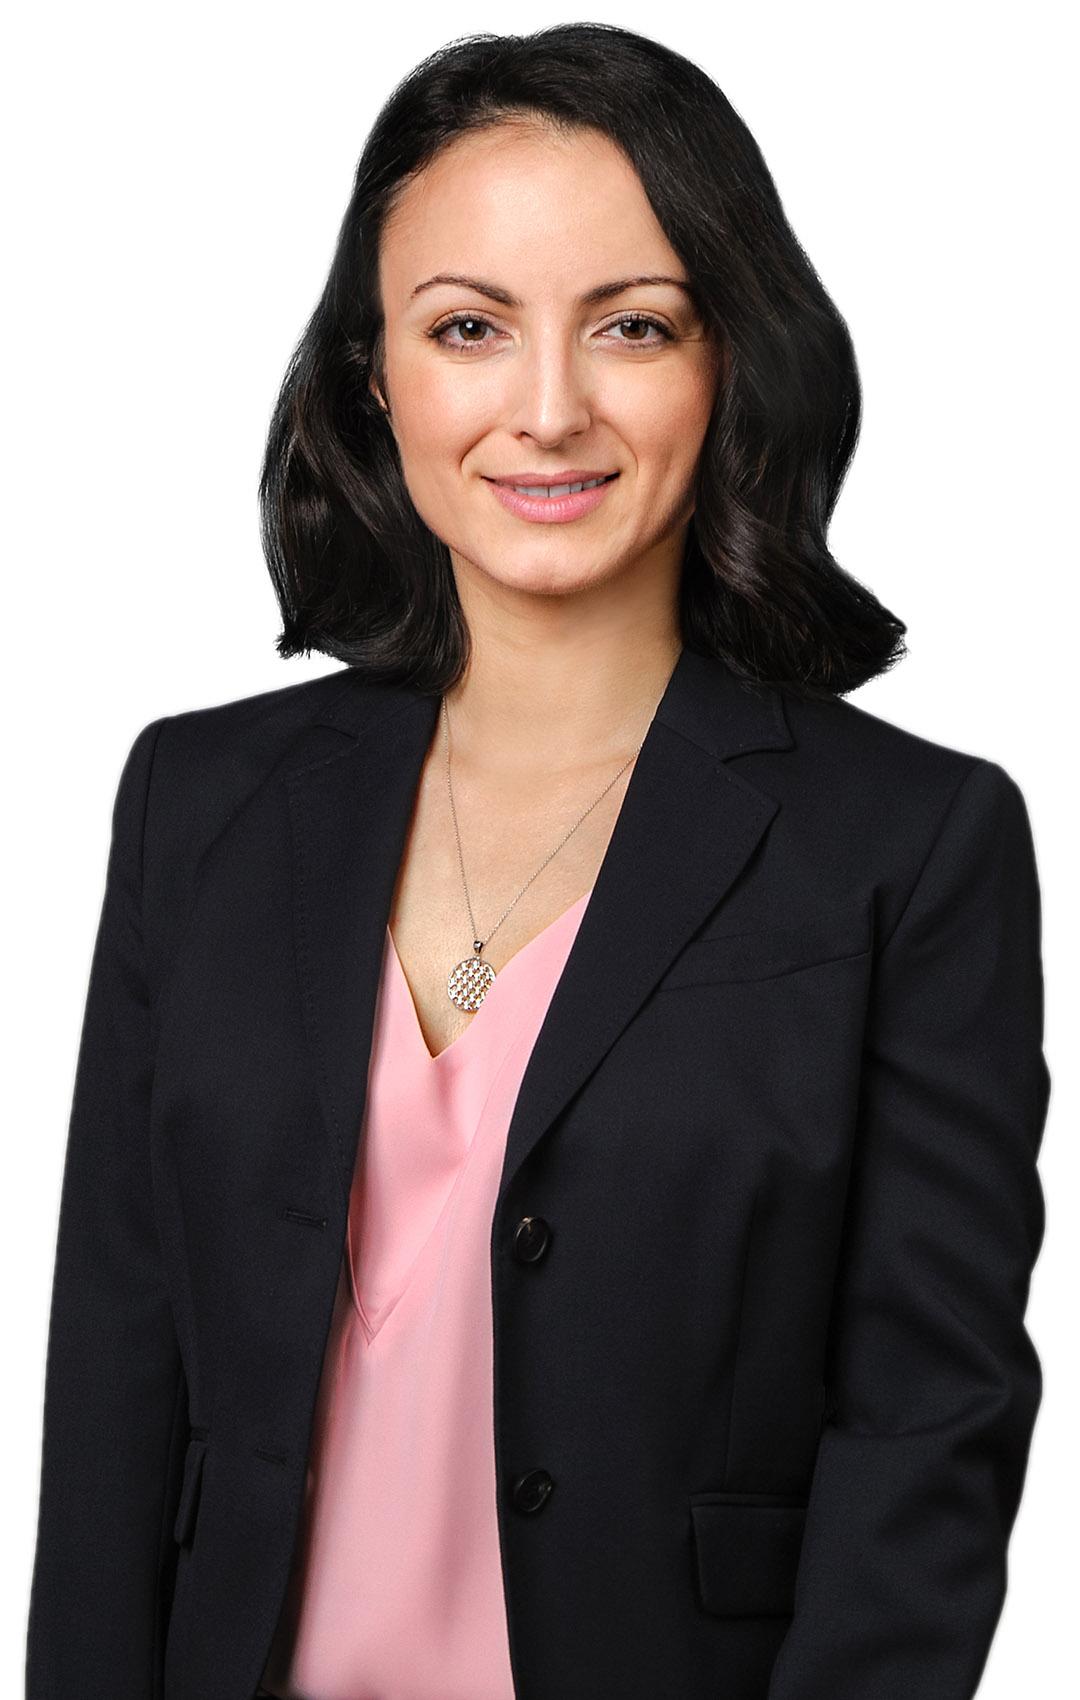 Aleksandra Strang